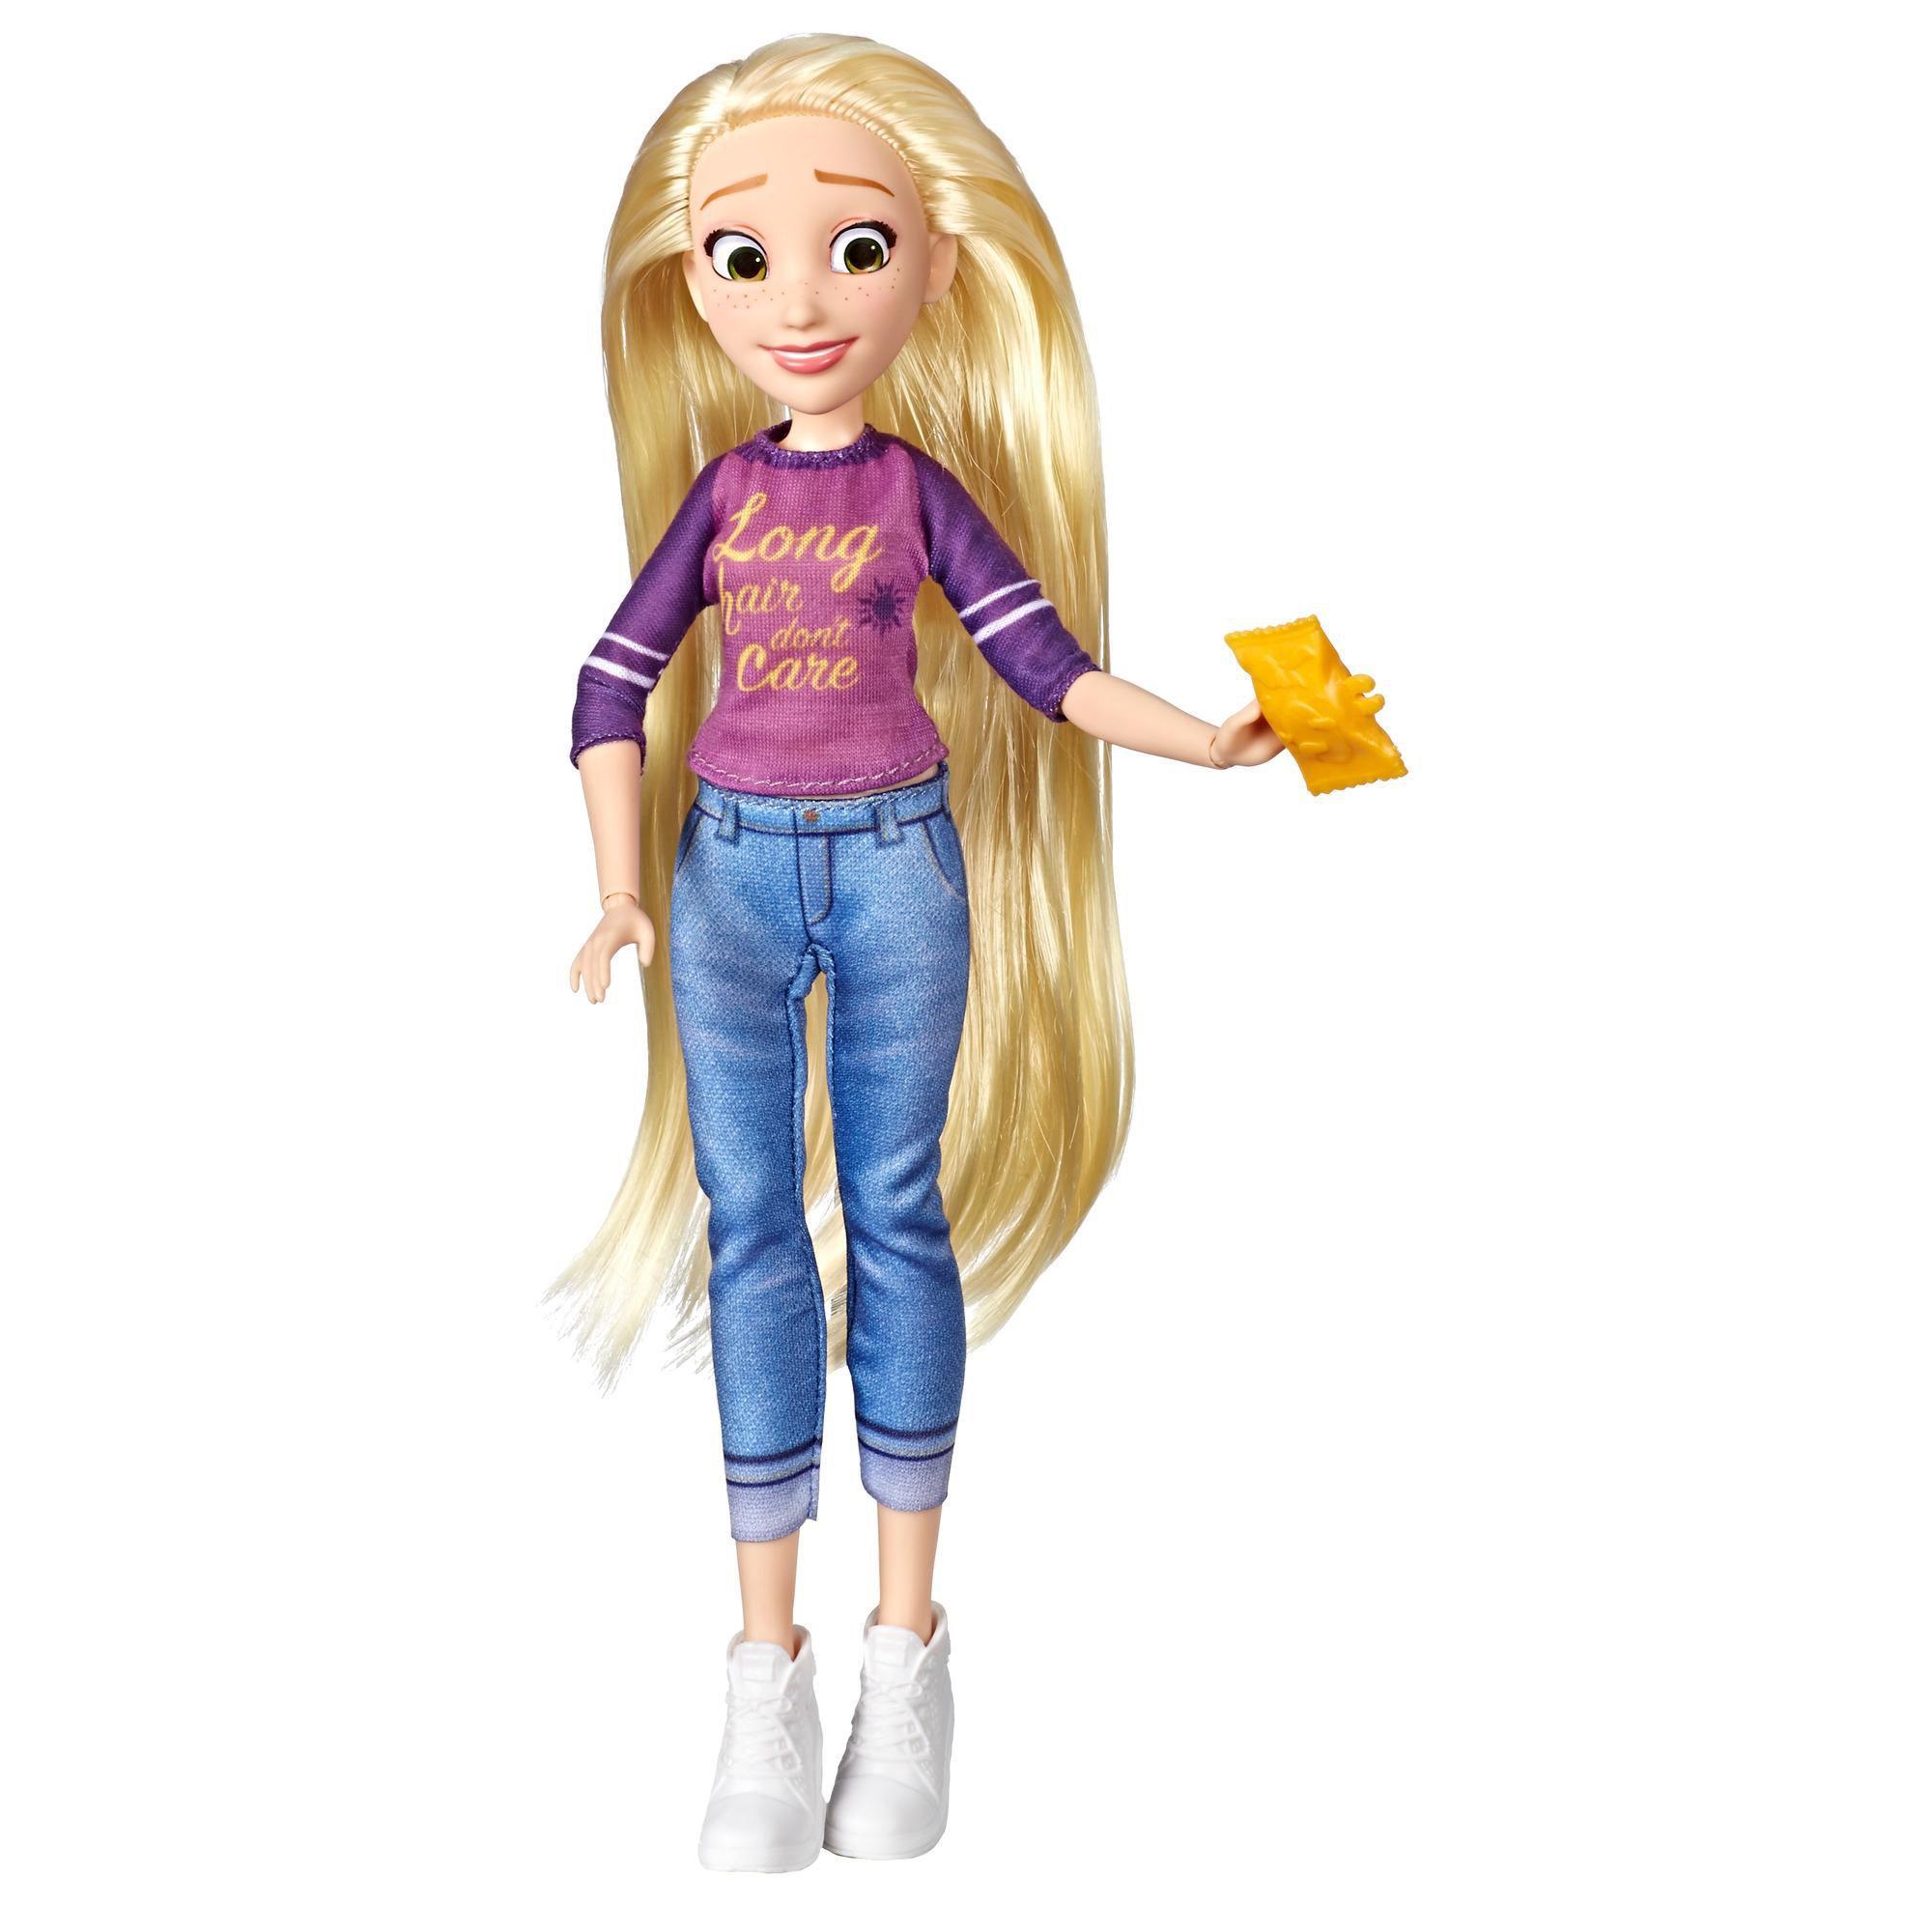 Princesa Disney Comfy Squad RAPUNZEL Detona Ralph 2 E8402 - Hasbro